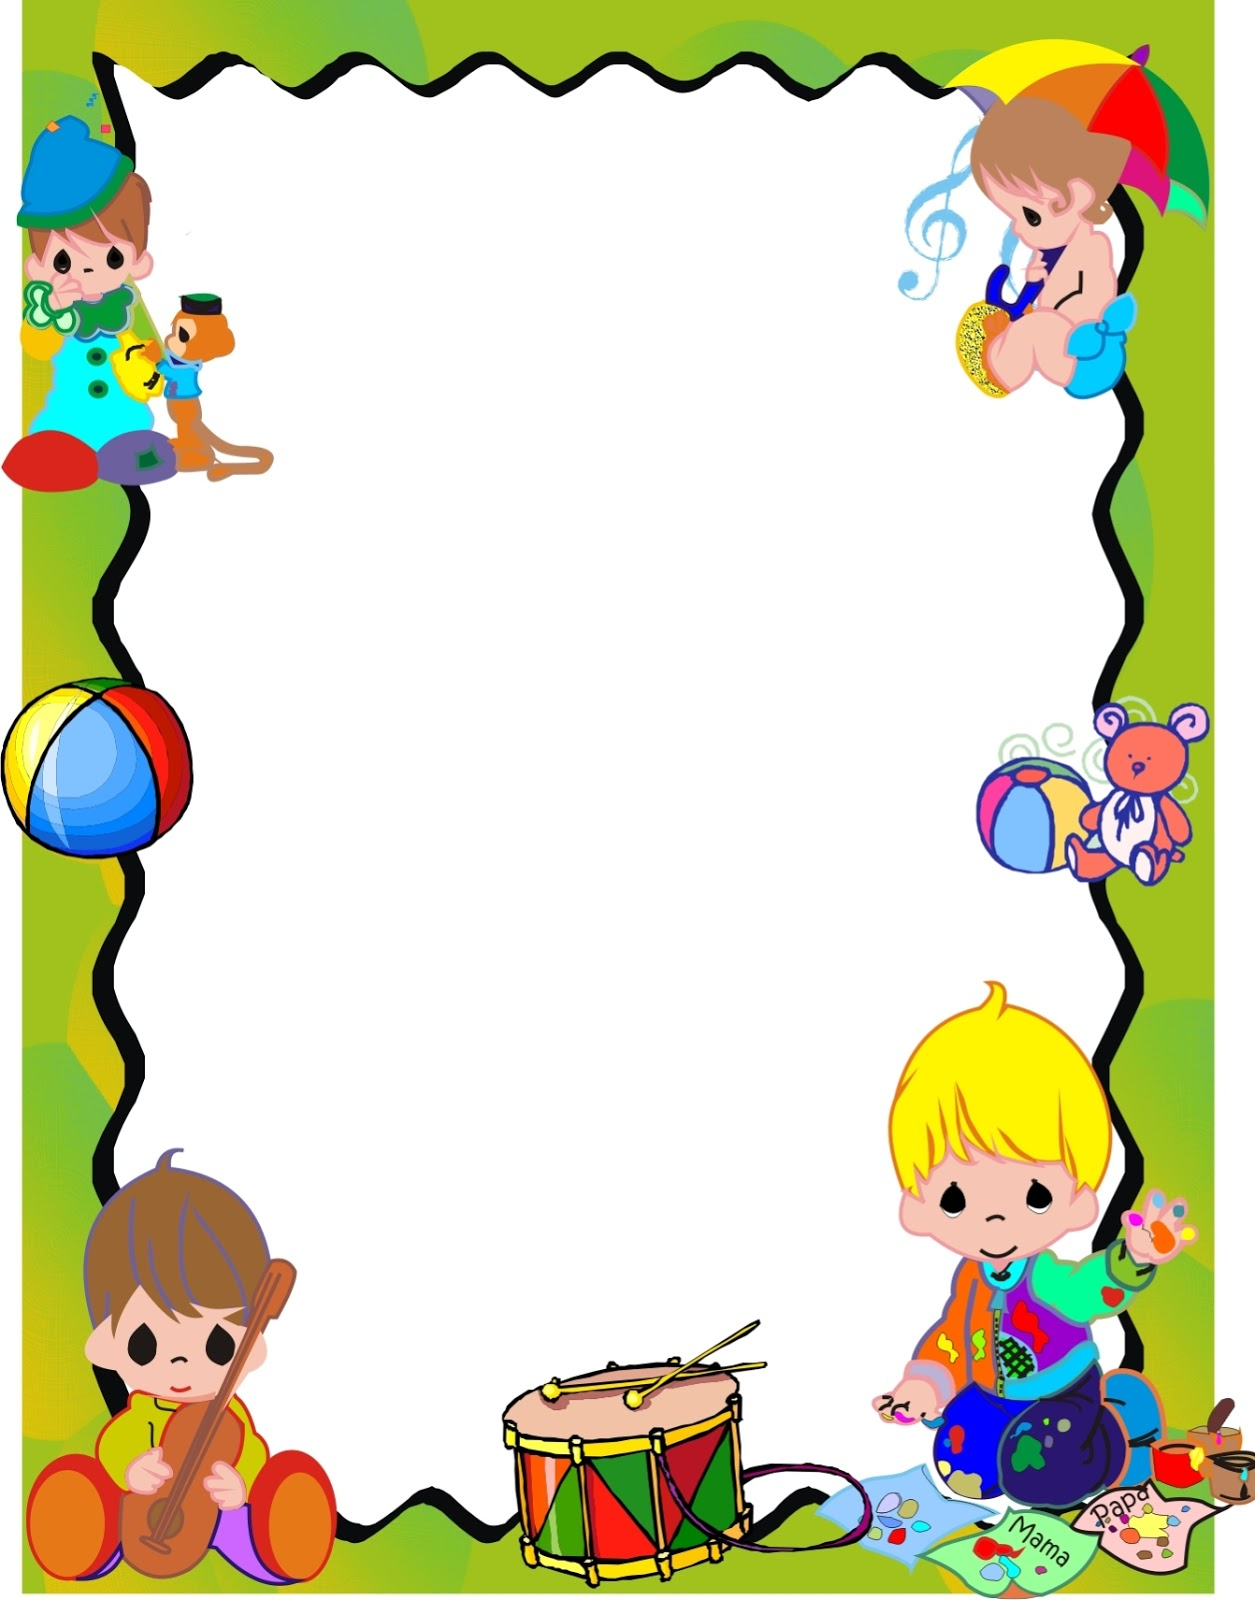 Portadas infantiles para imprimir - Imagui